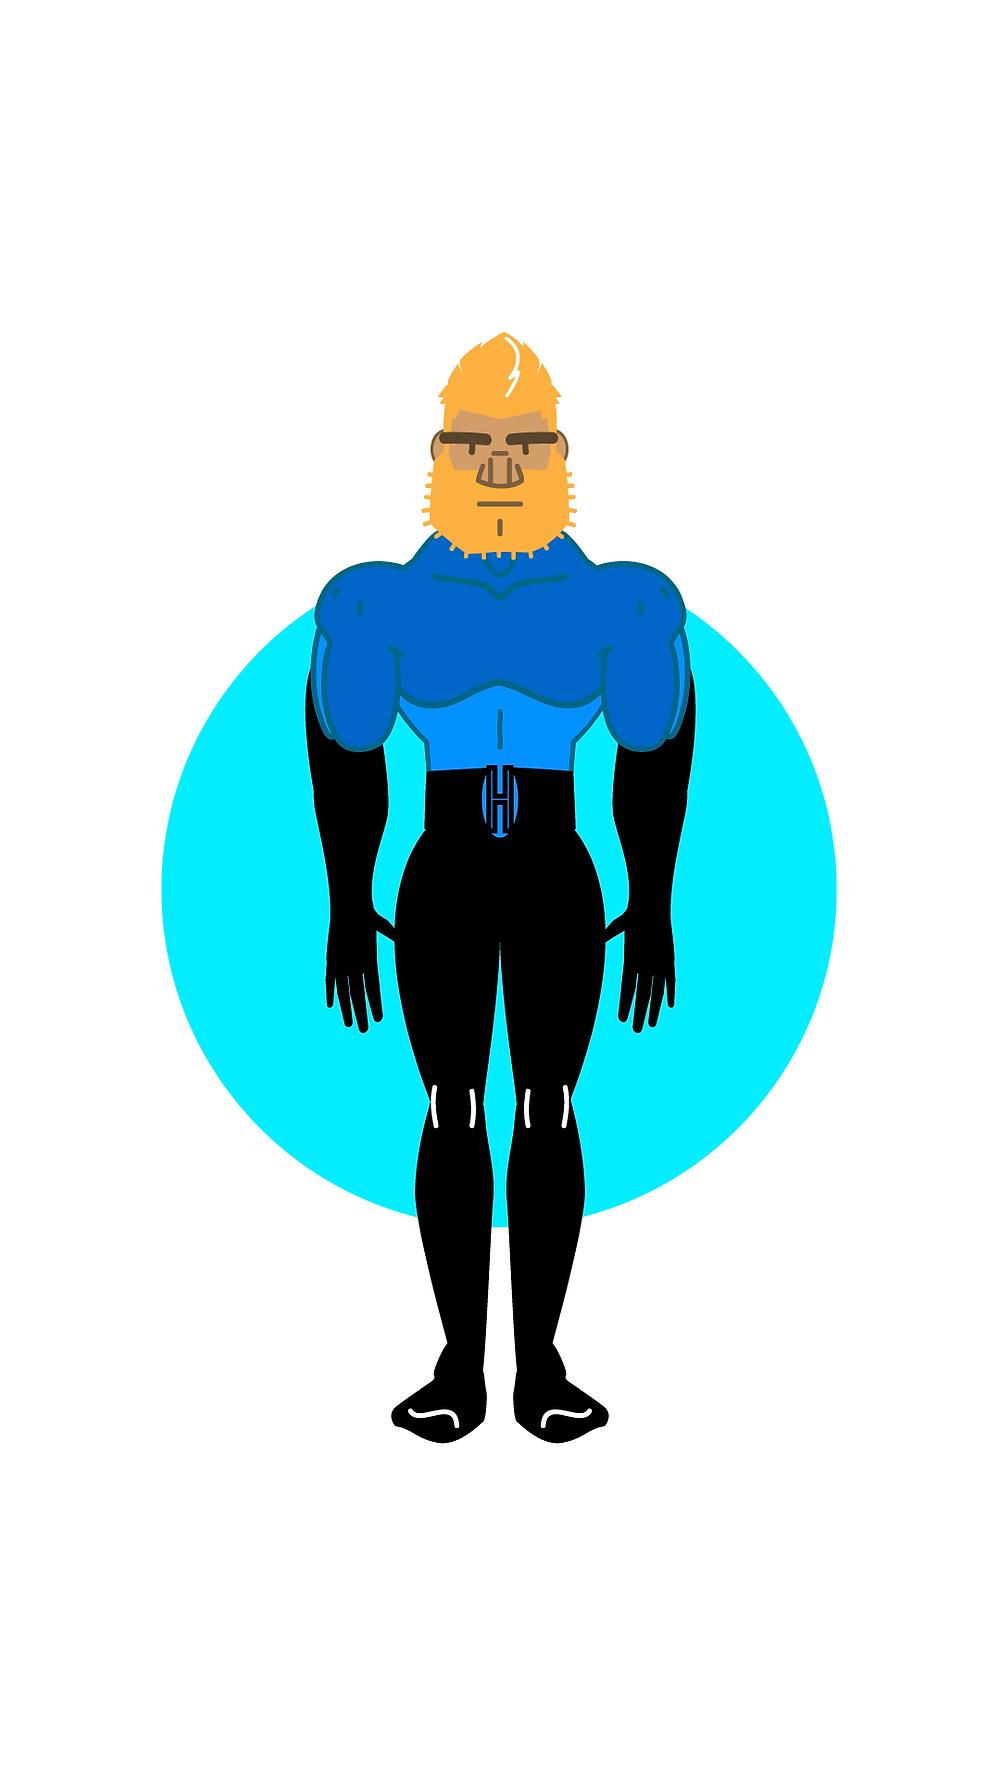 HackUman Blue, Faced, Vectored